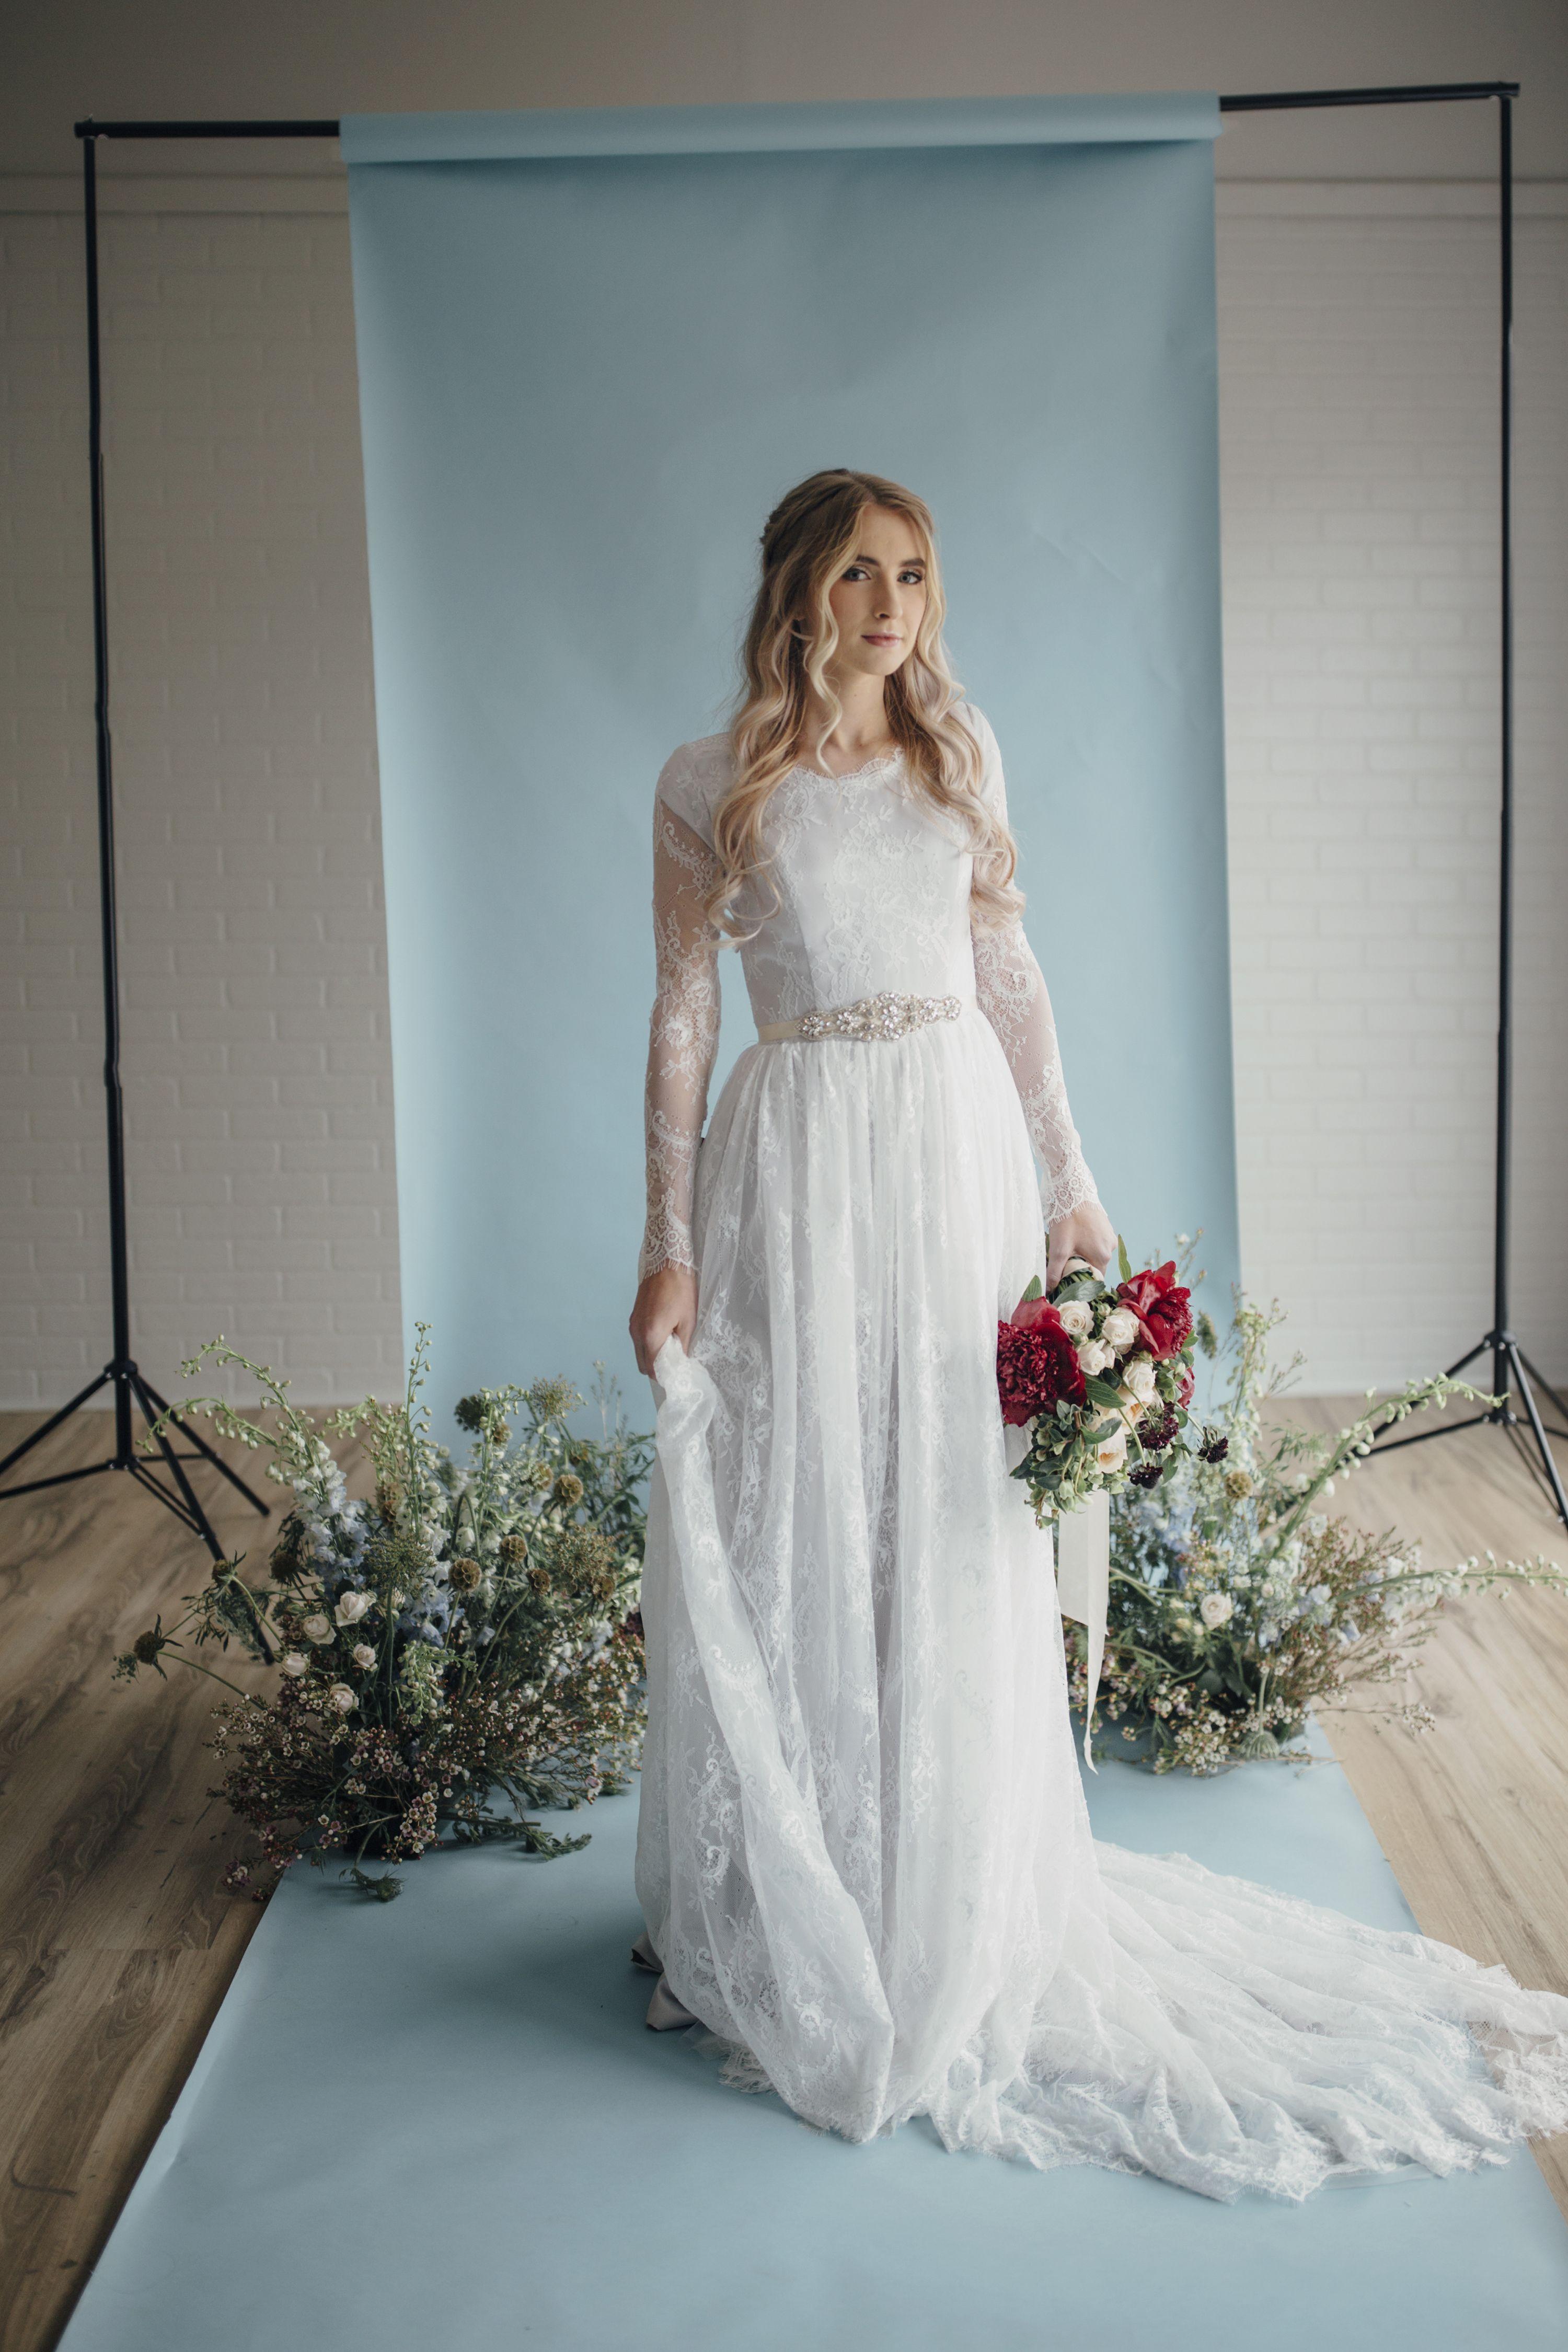 Fern gown by Elizabeth Cooper Design | Photo by Cassandra Farley ...